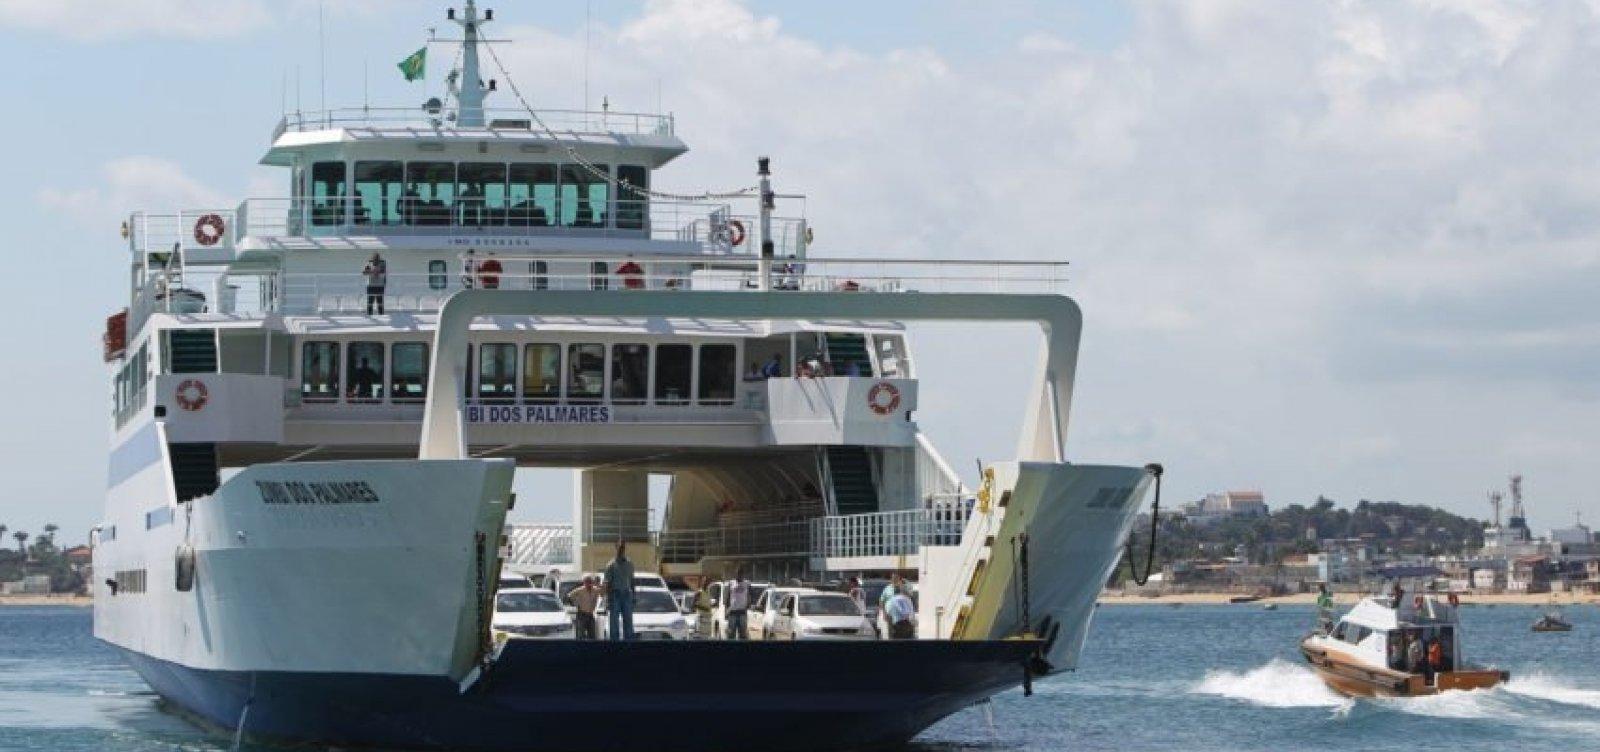 [Ferry-boat registra fluxo tranquilo na tarde deste domingo]